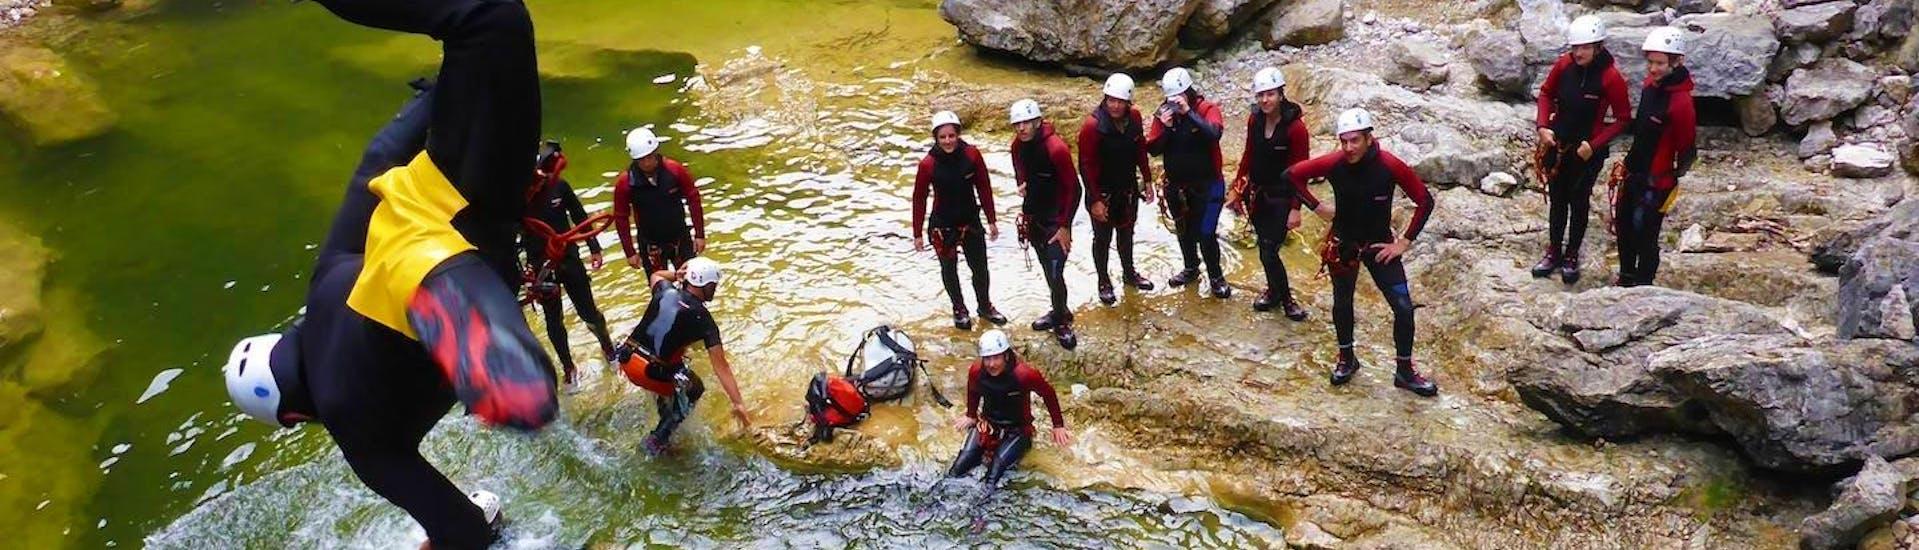 Canyoning & Rafting - Adventure Weekend